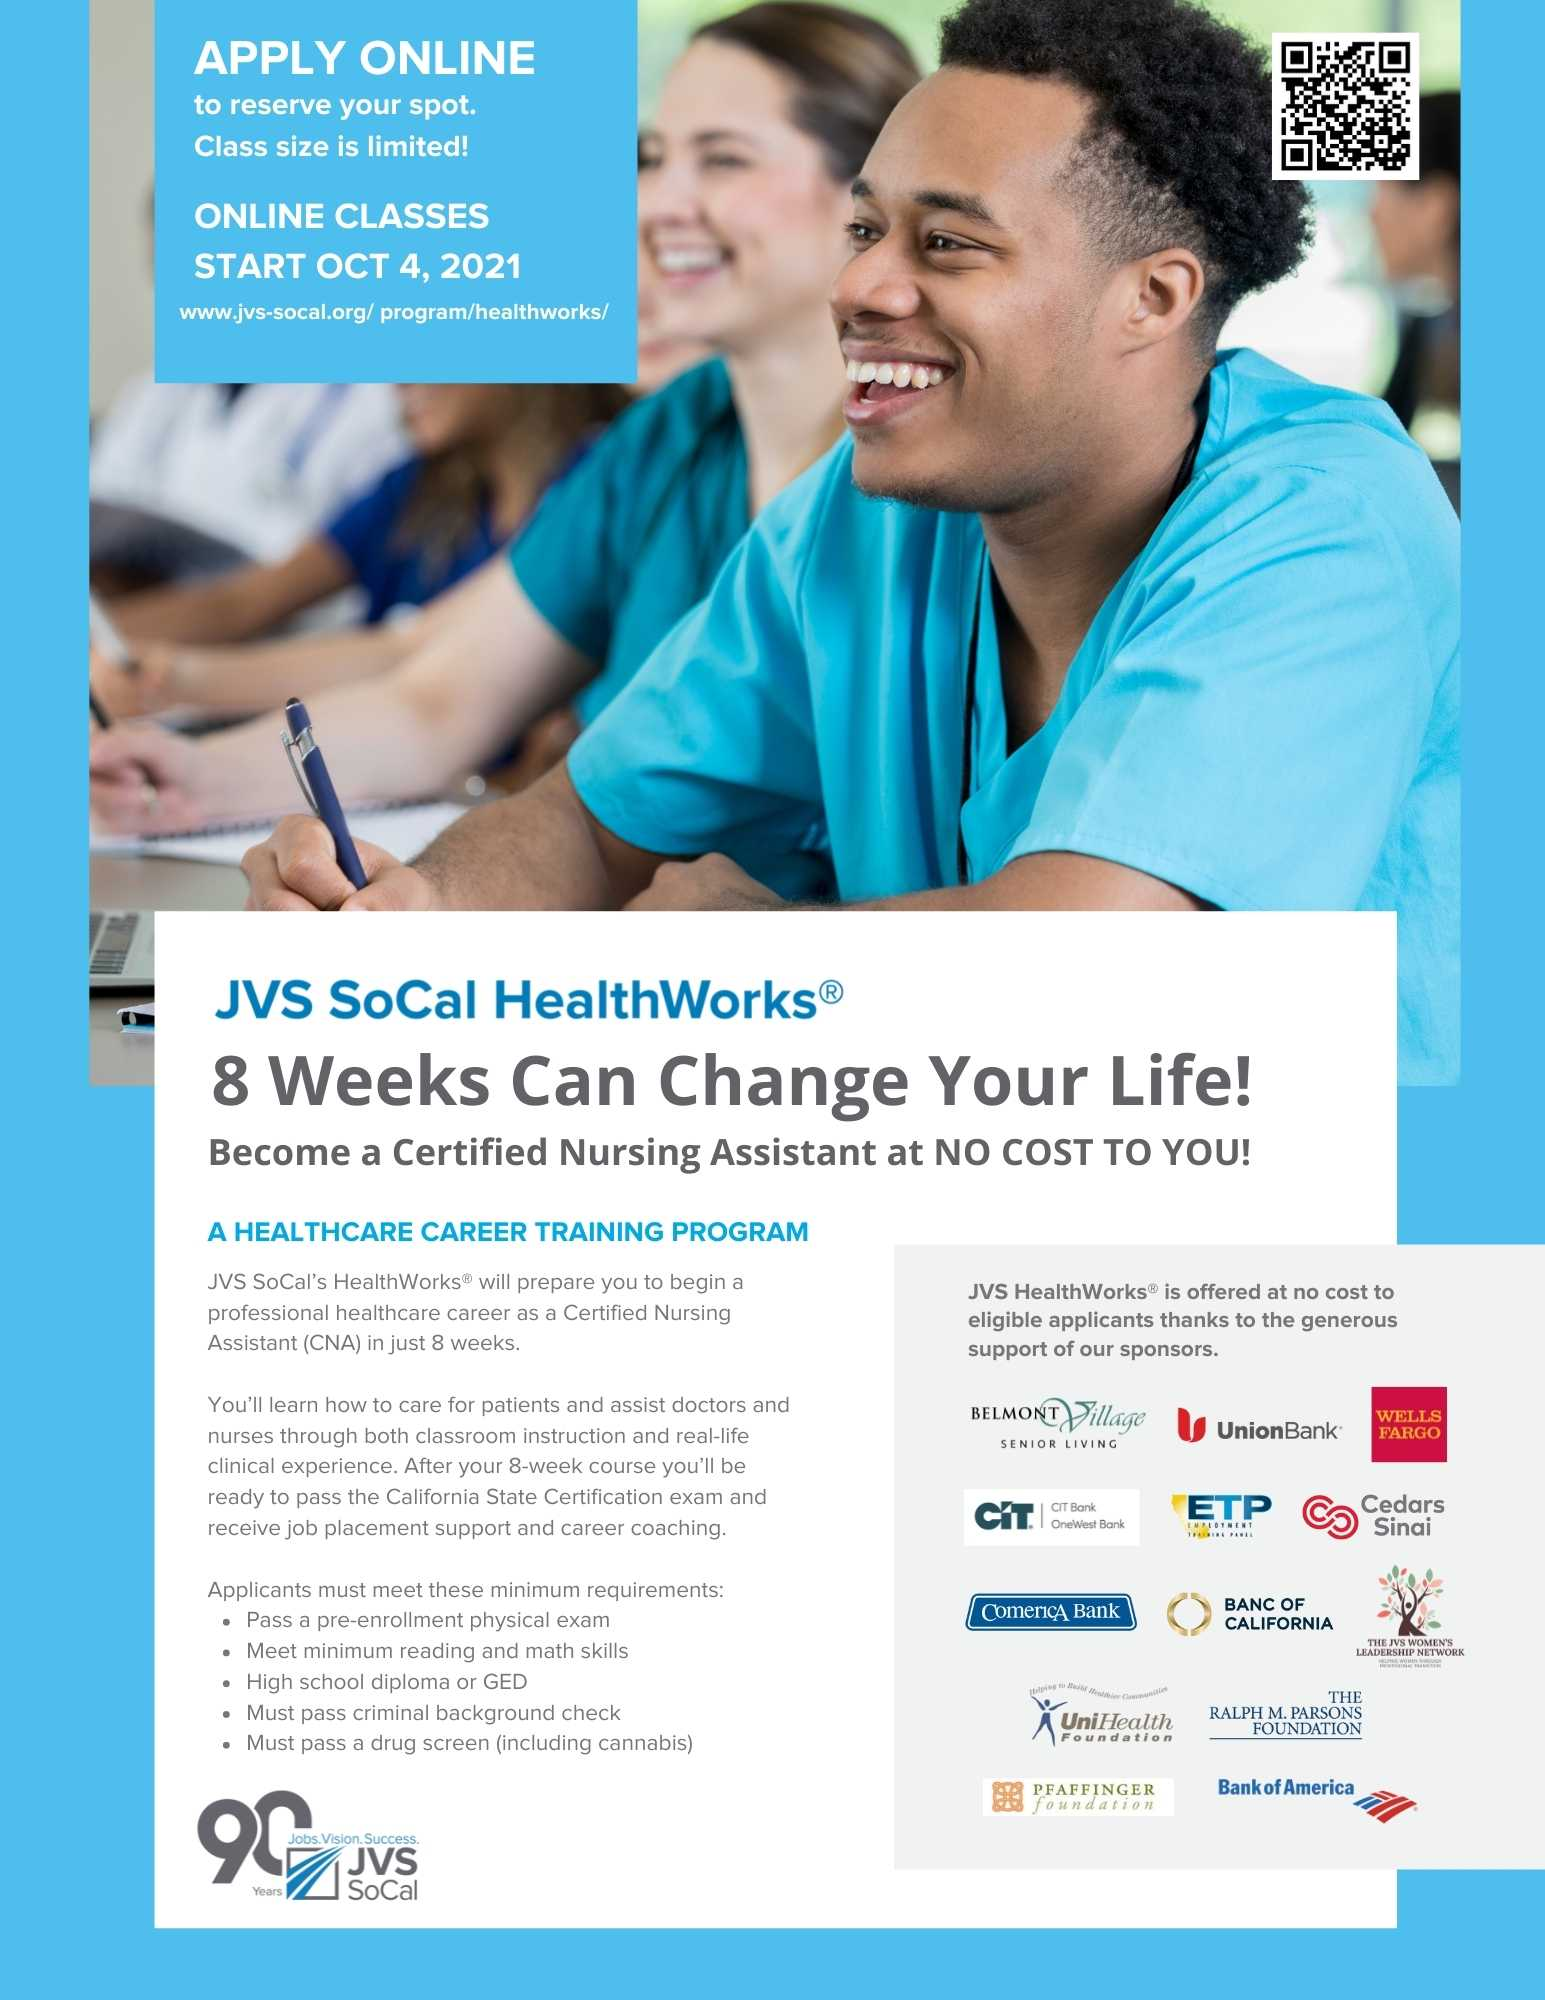 JVS SoCal HealthWorks Program Flyer